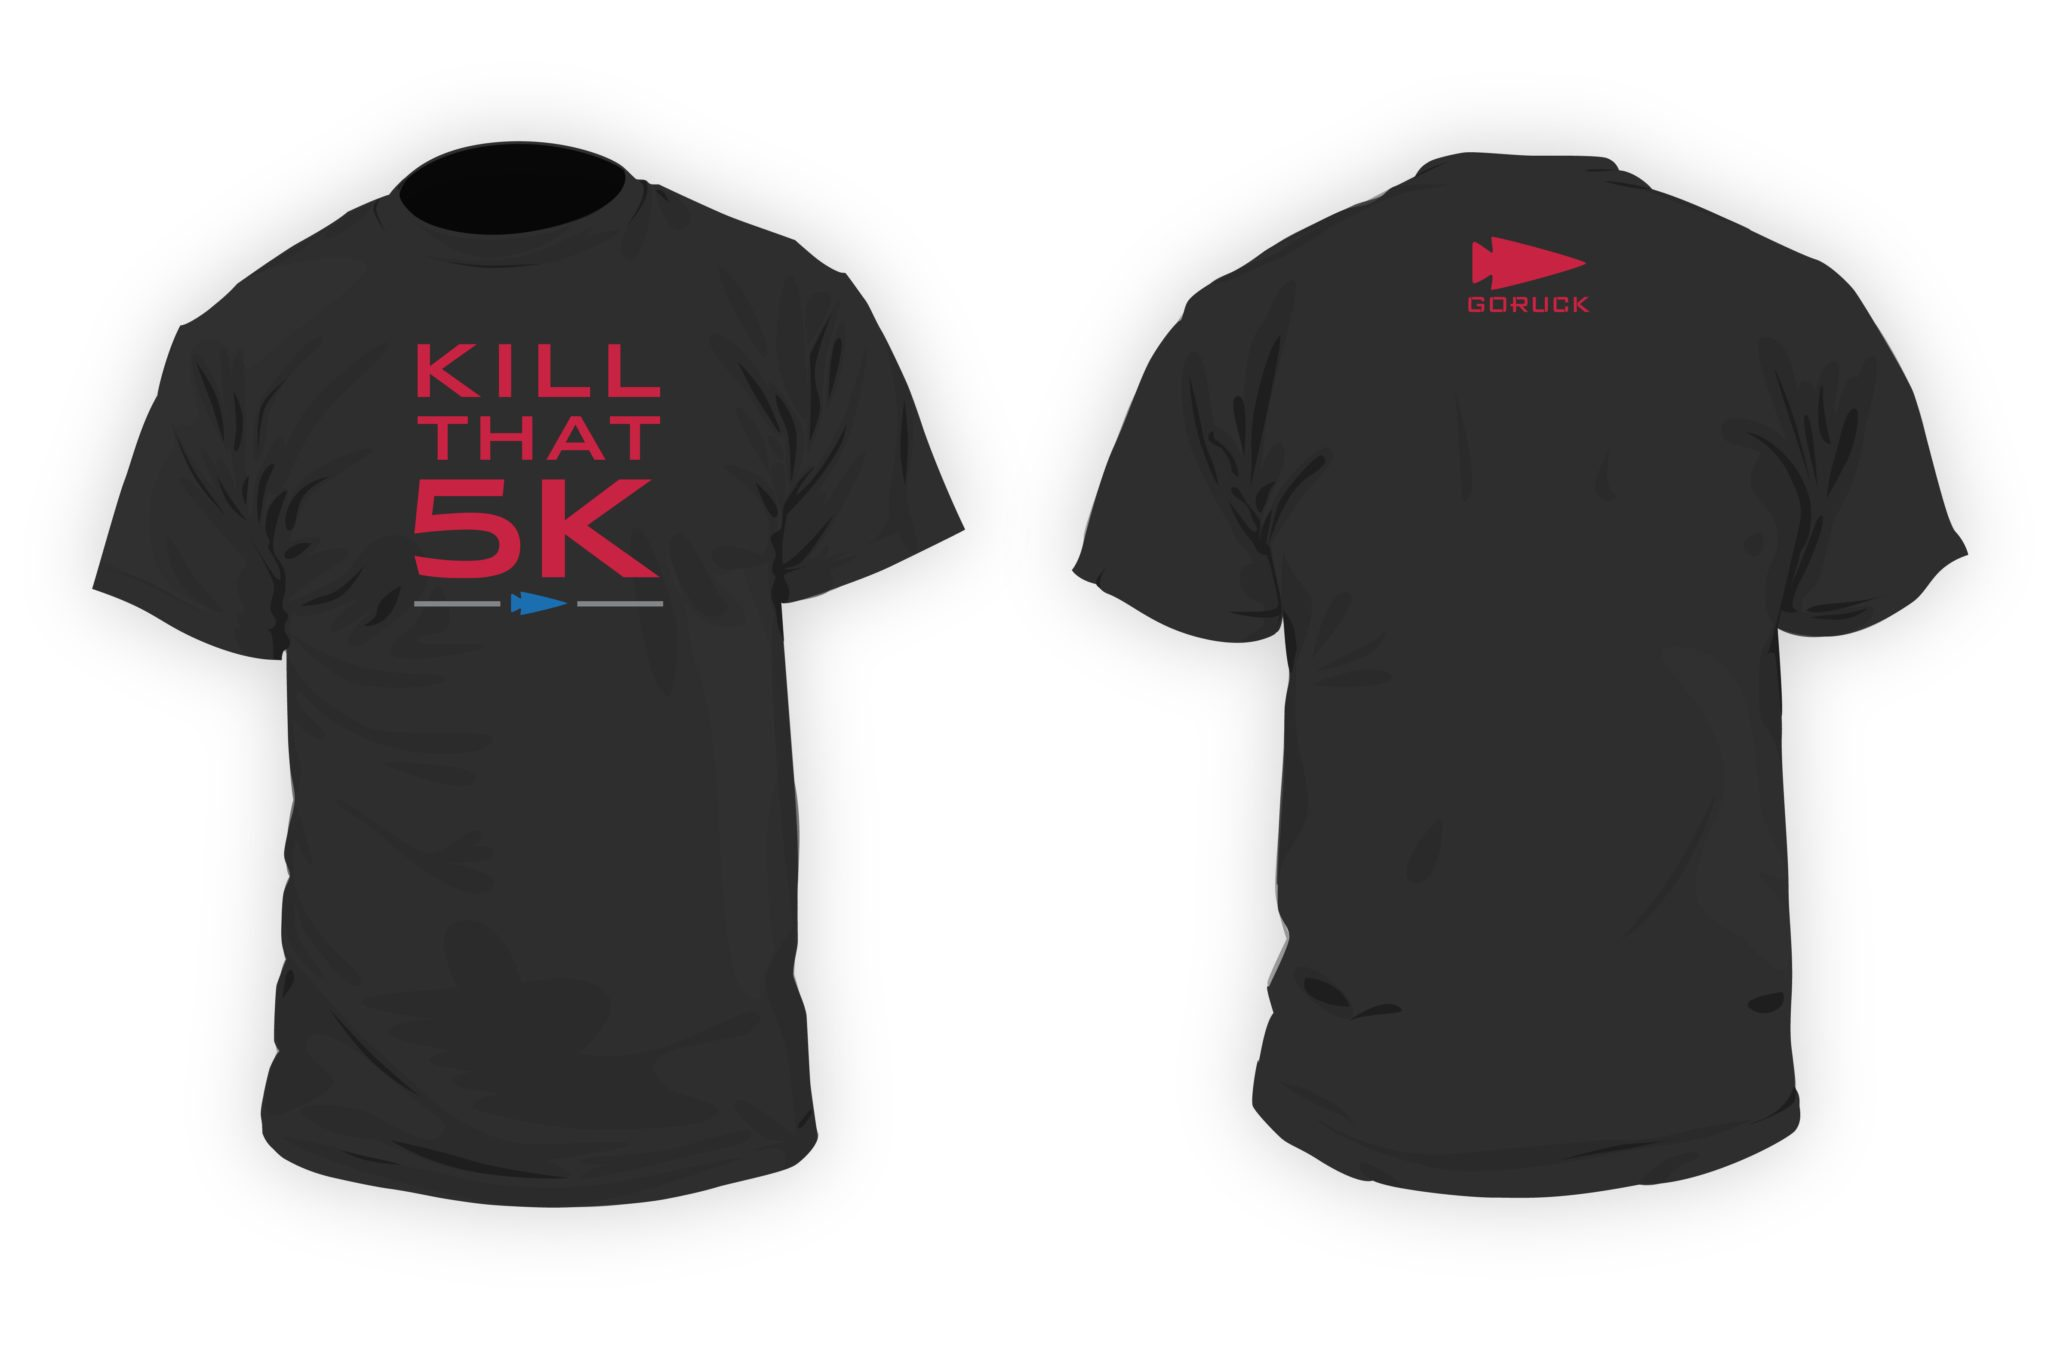 Kill That 5k Shirt Black